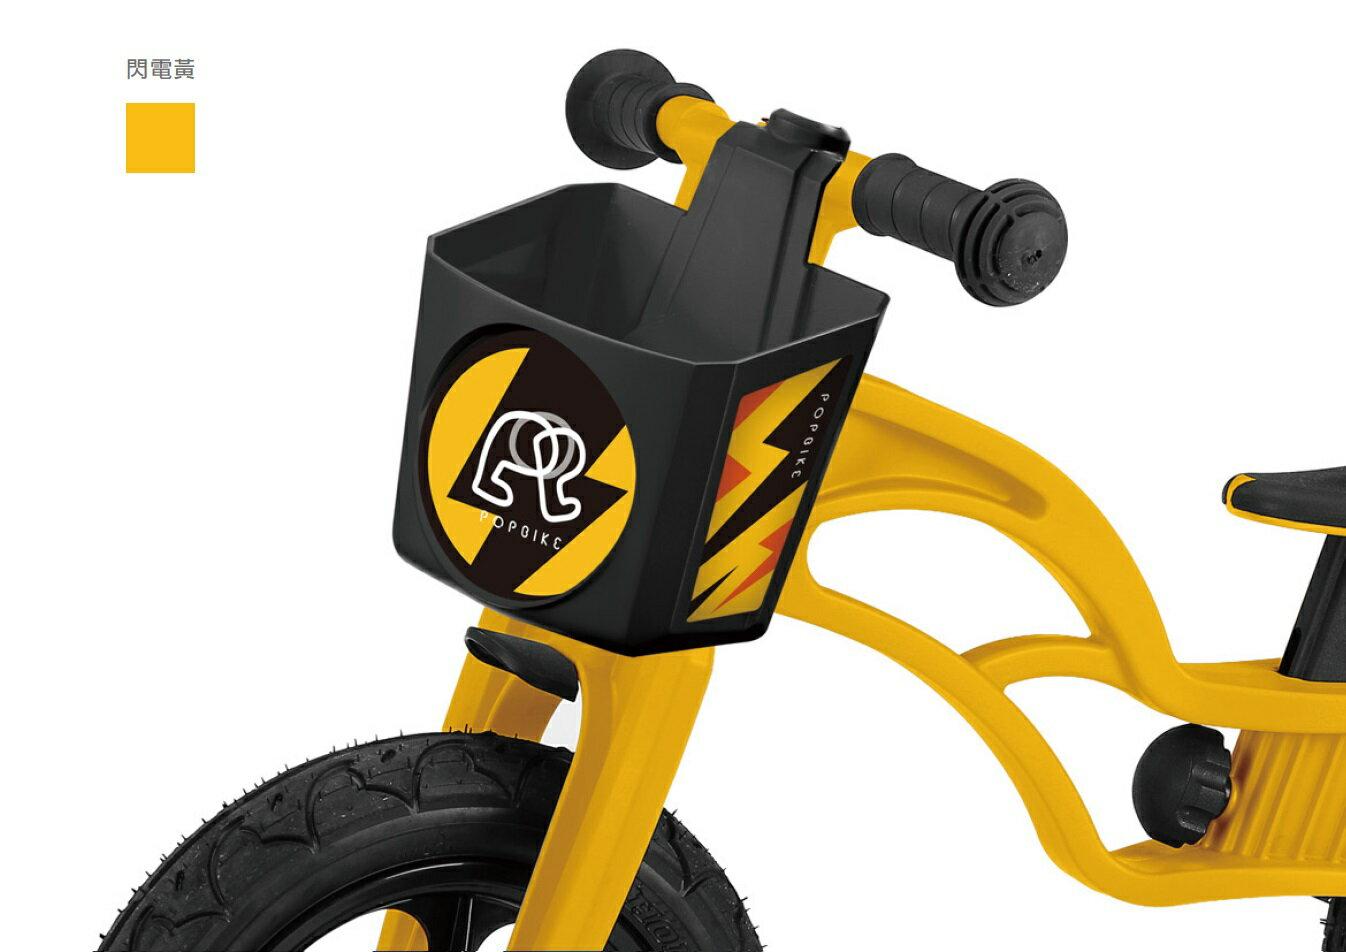 POPBIKE 車籃 (閃電黃) - 限時優惠好康折扣